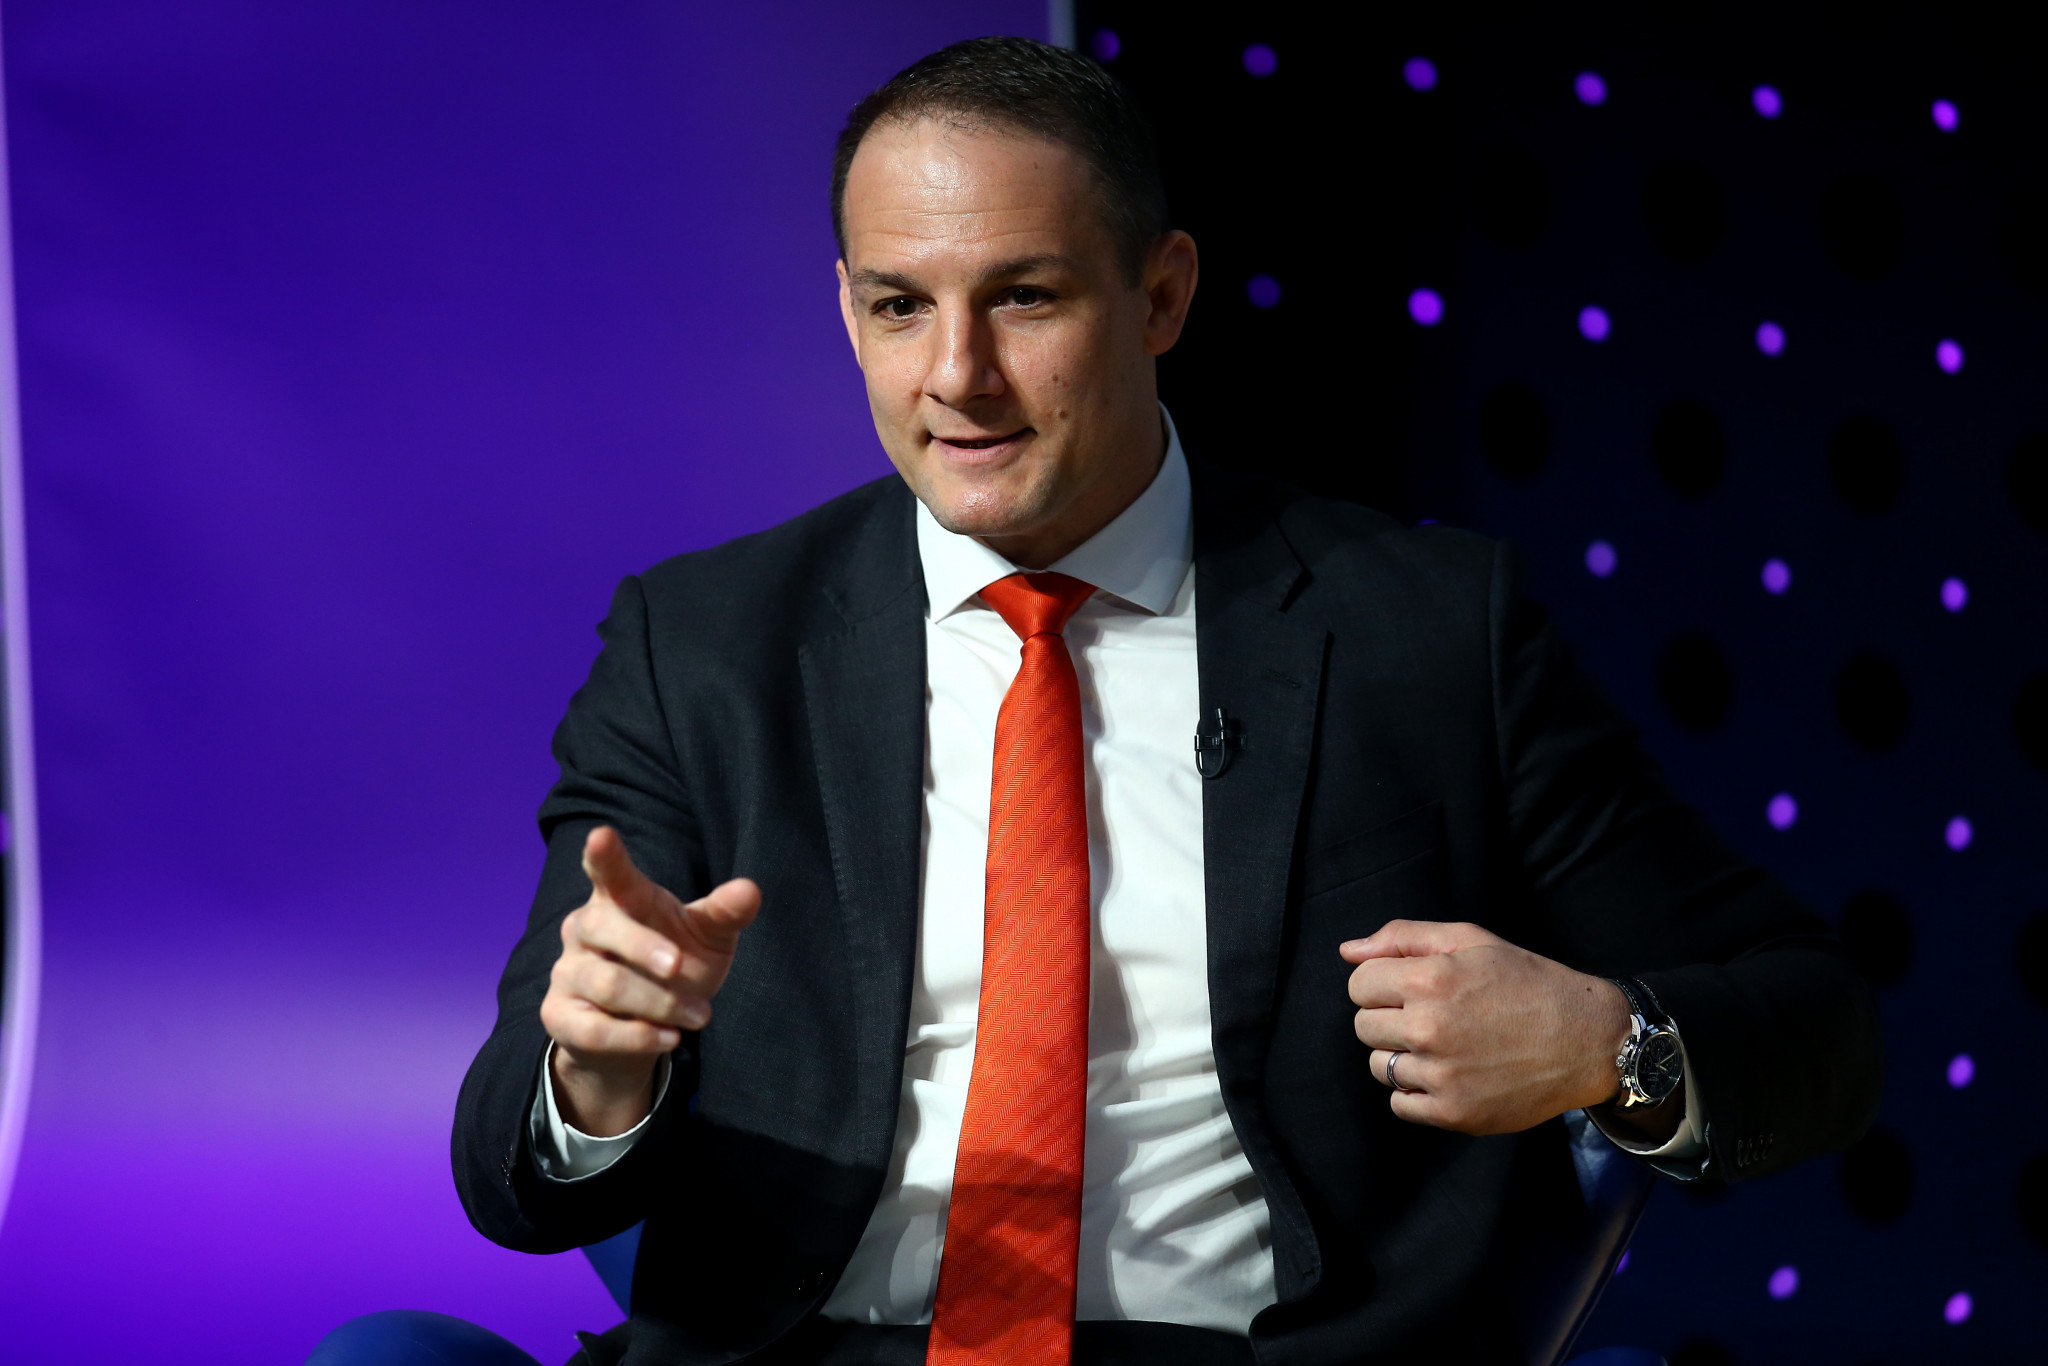 Commonwealth Games Federation chief executive David Grevemberg said he was